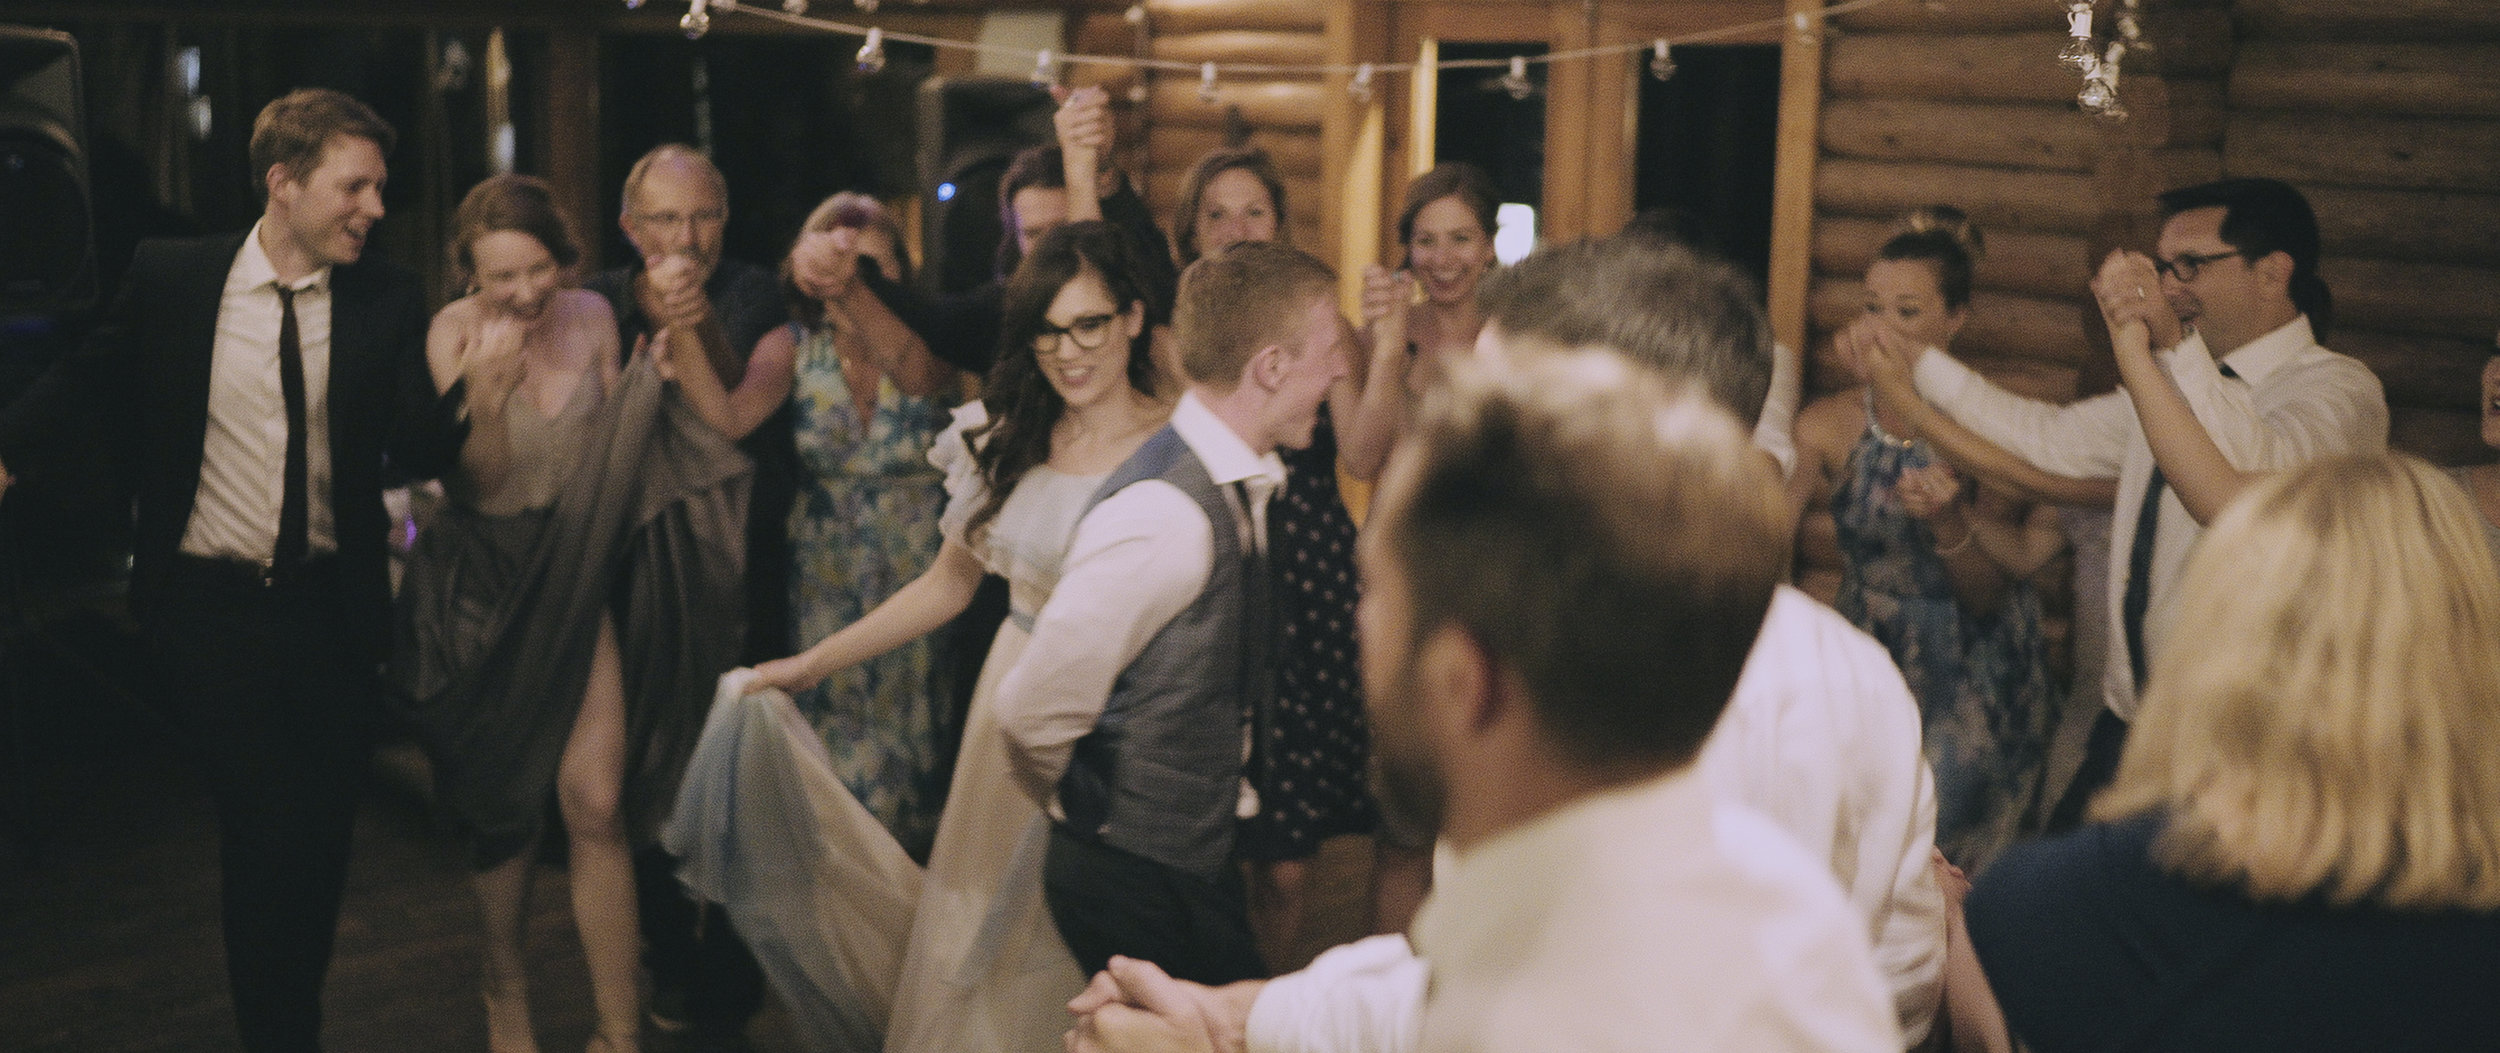 Vancouver Island Wedding Videography-4.jpg